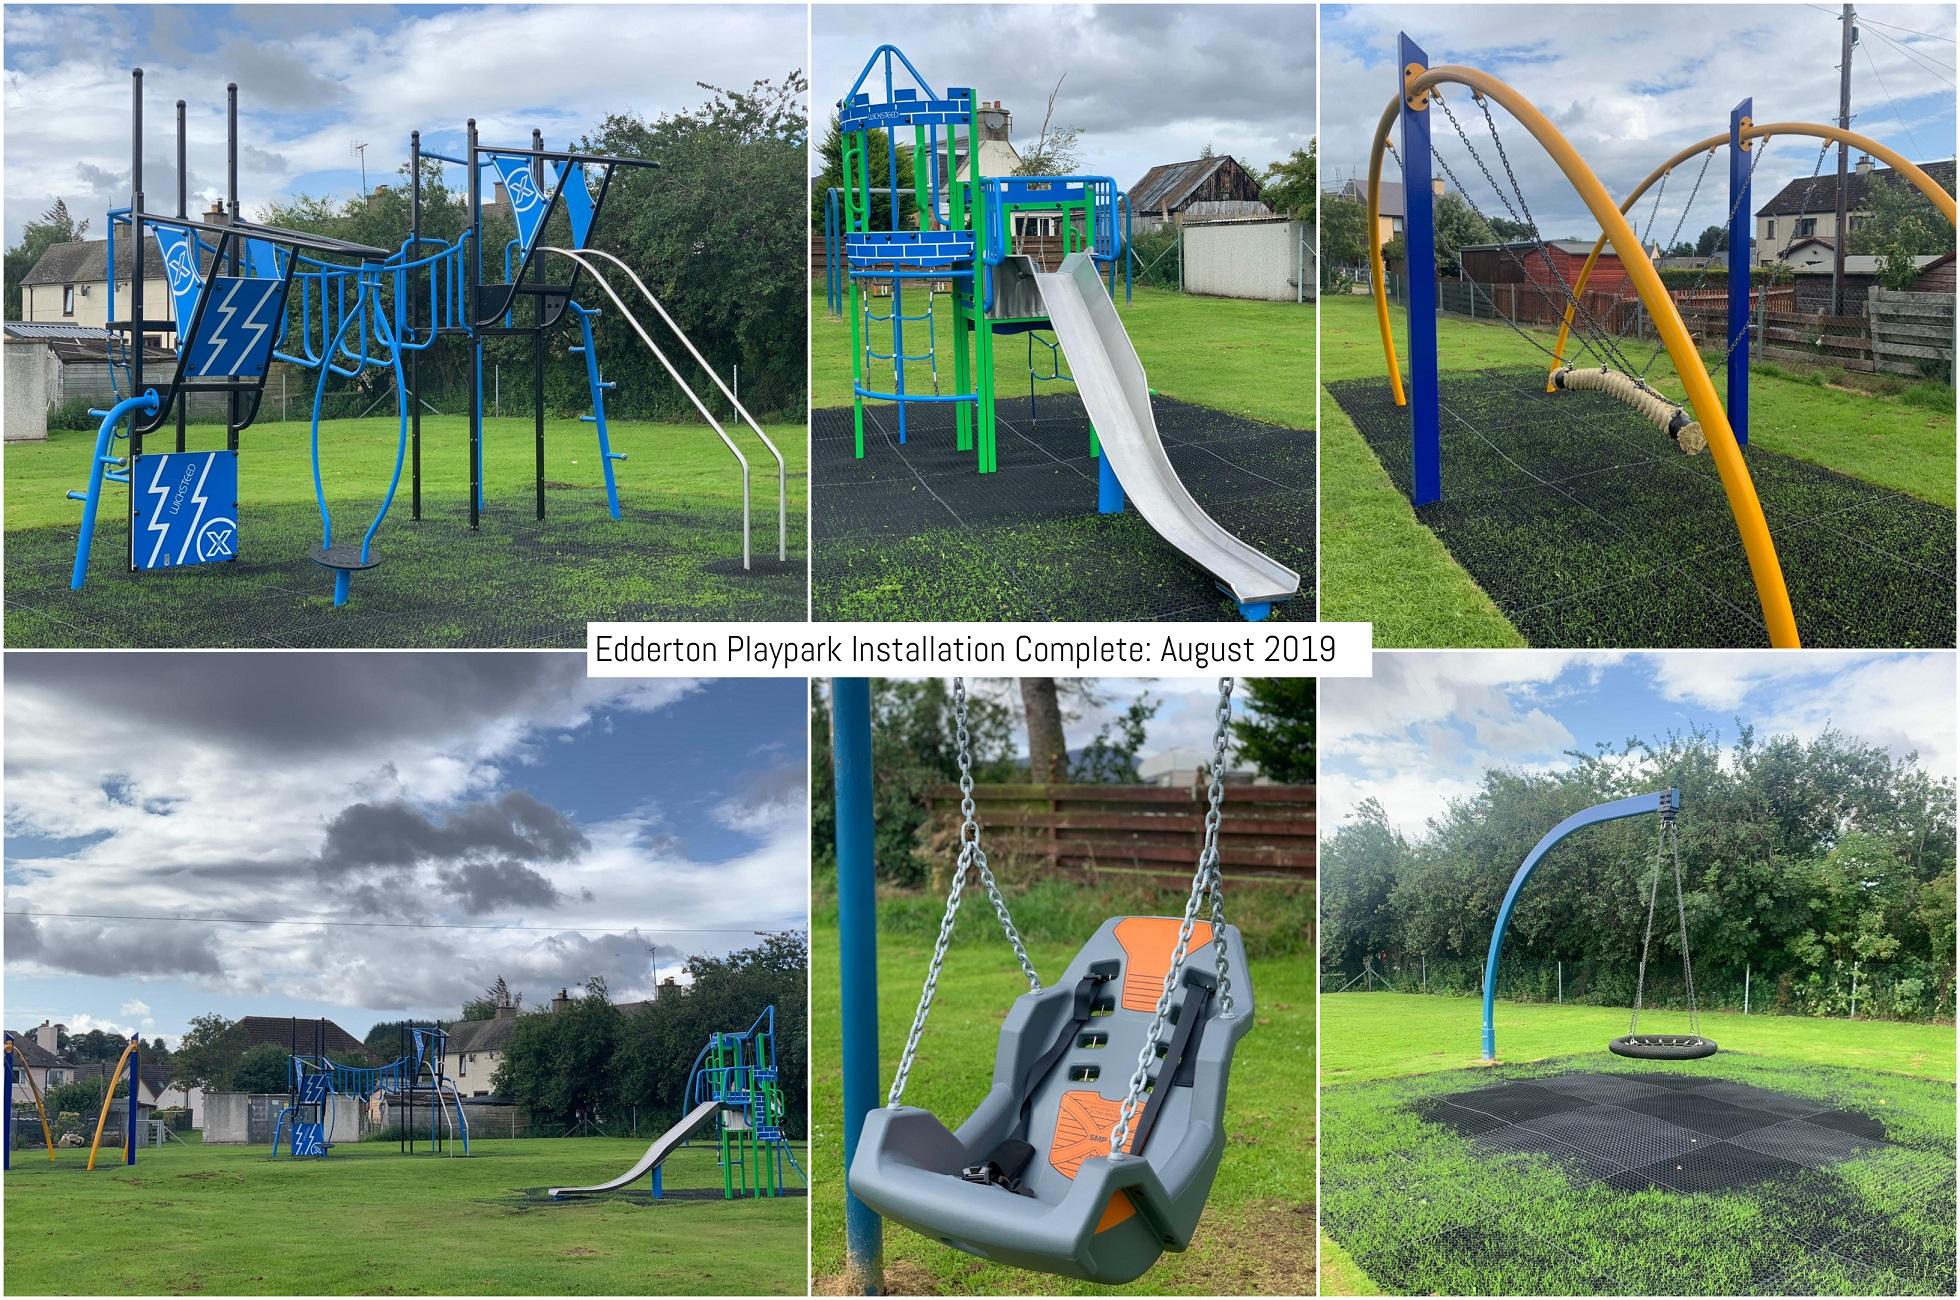 Image of Edderton Playpark